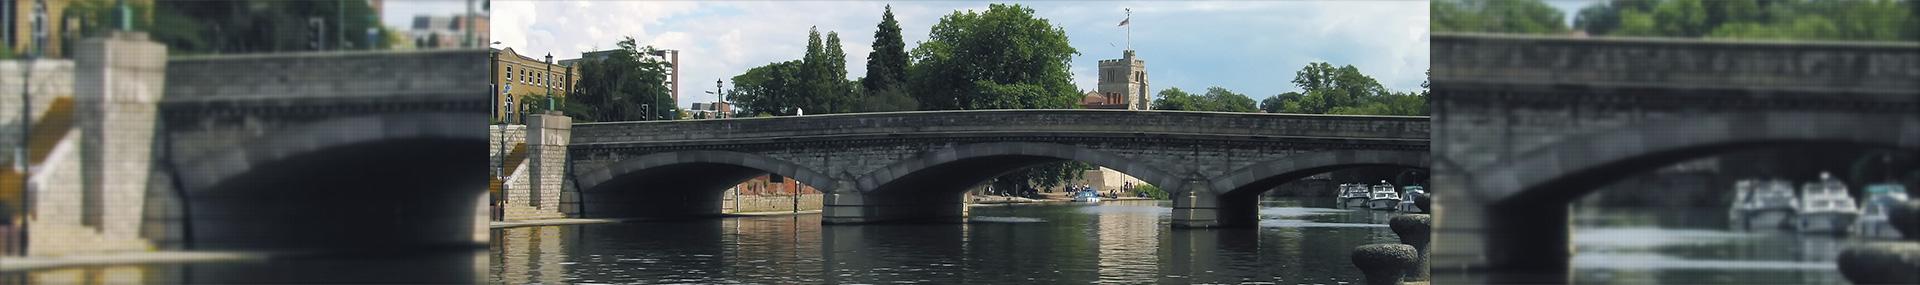 Maidstone_Bridge_Banner